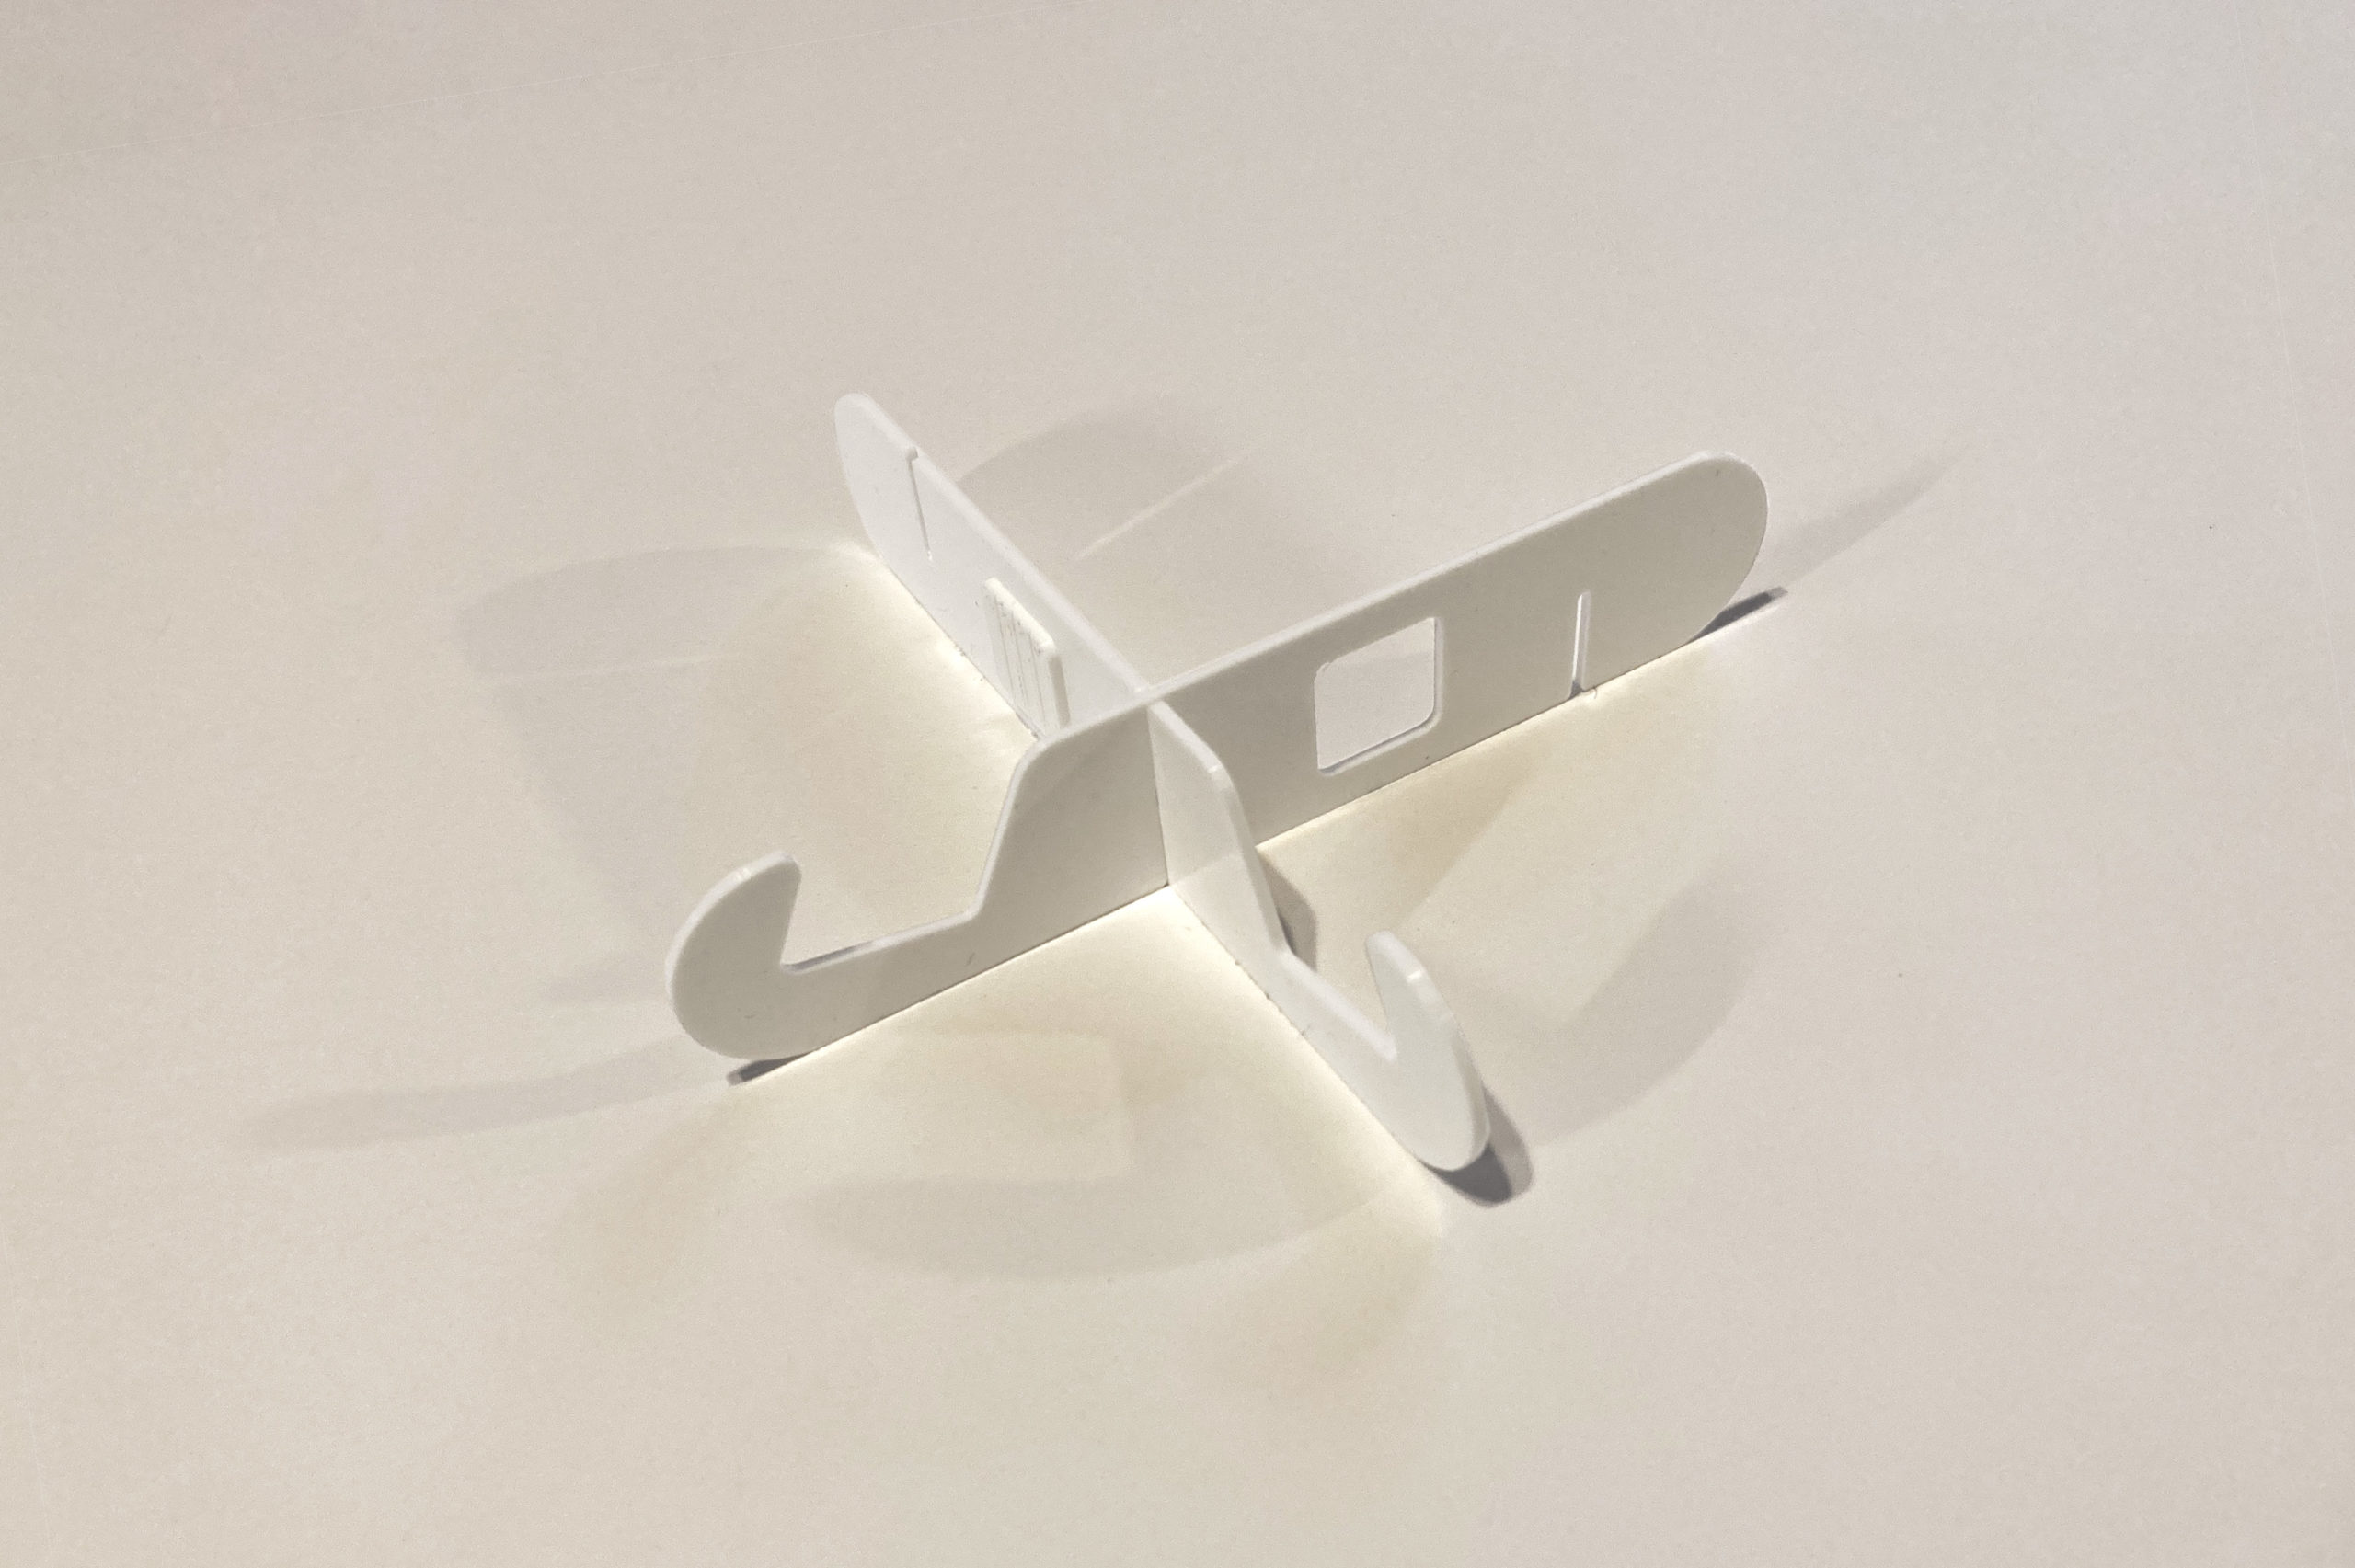 re:dock in white PLA plastic